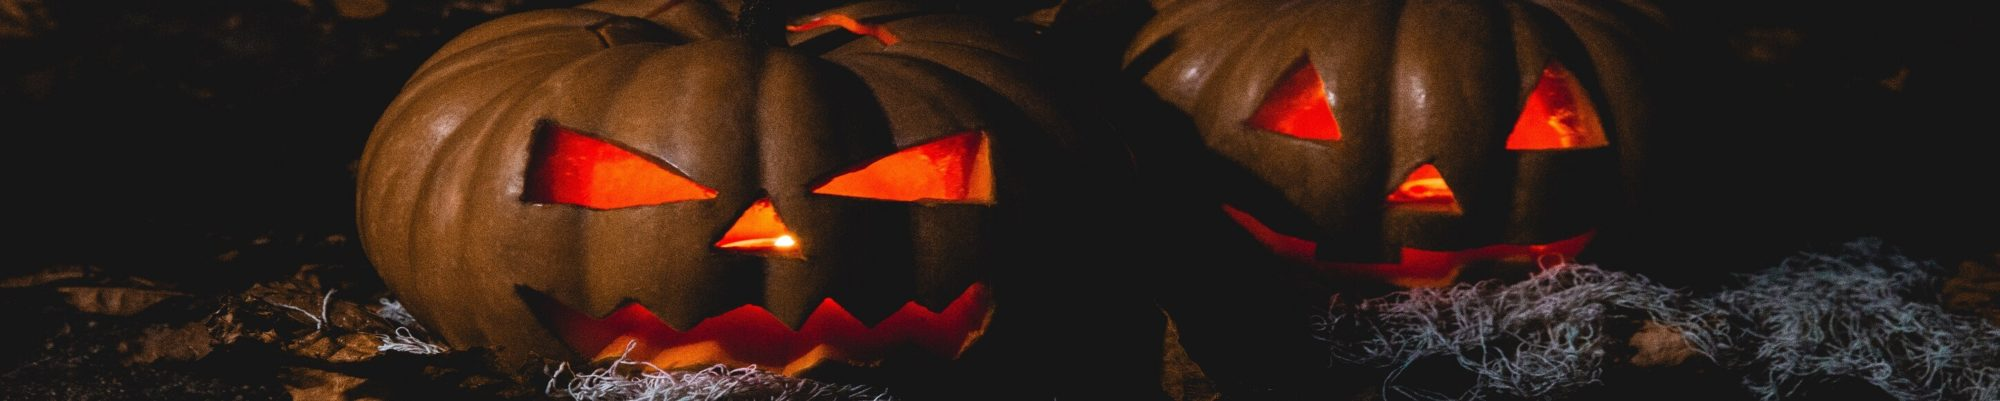 close-up-creepy-dark-619418